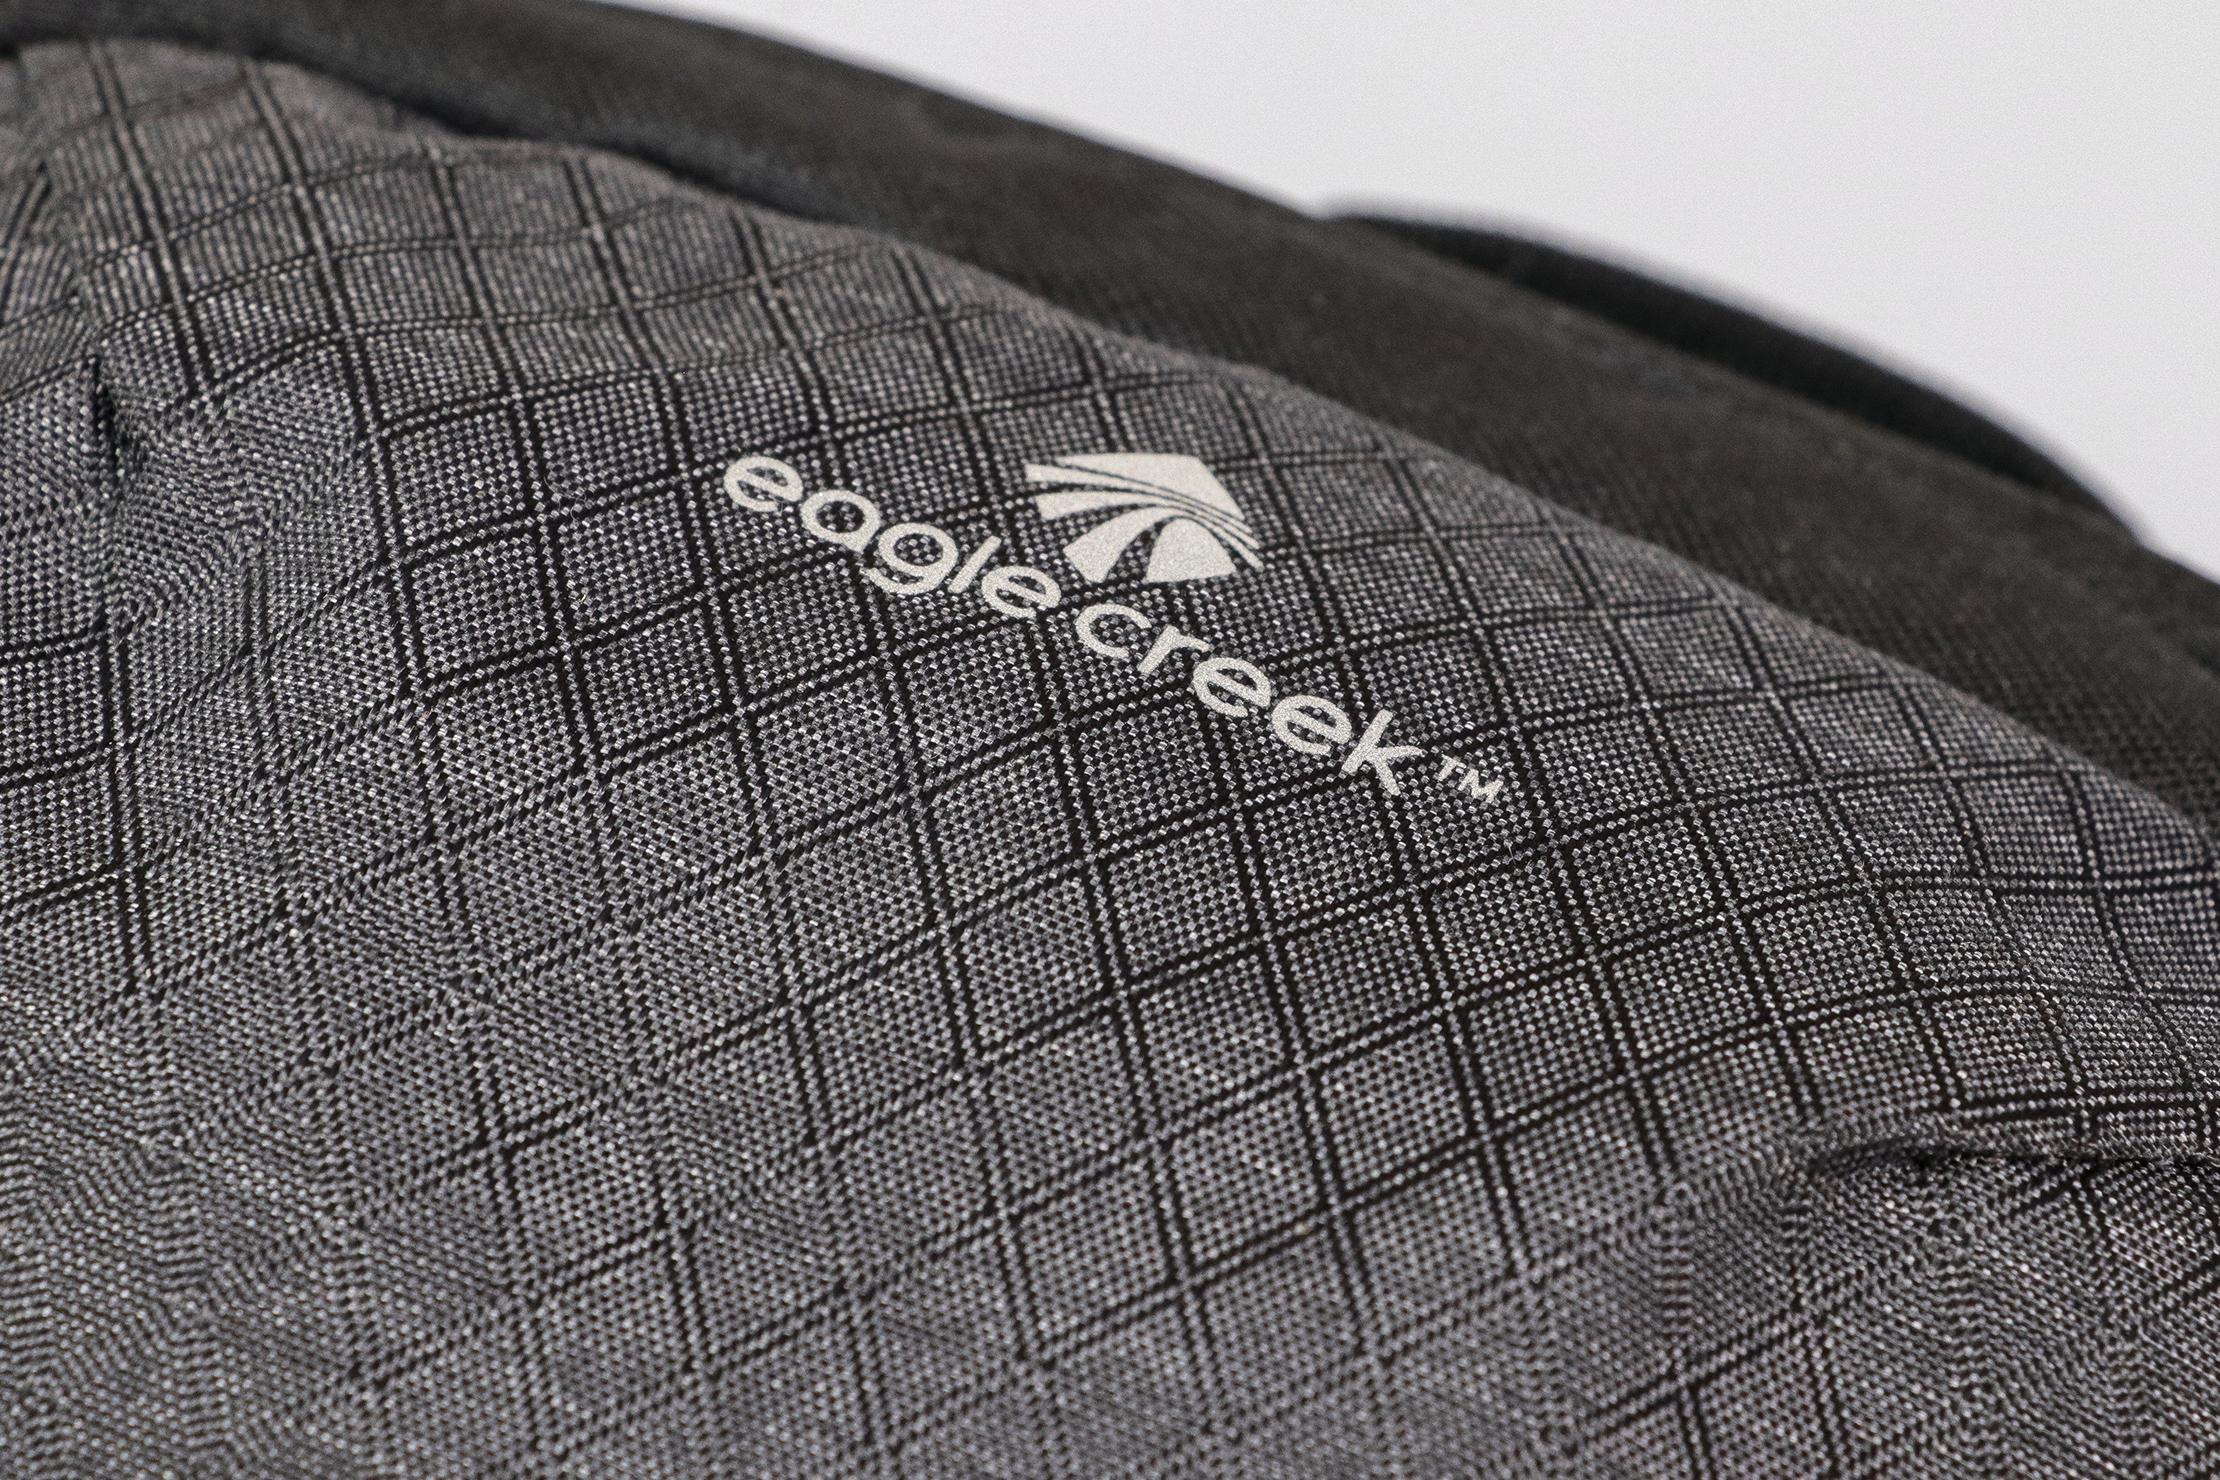 Eagle Creek Wayfinder Waist Pack Ripstop Material